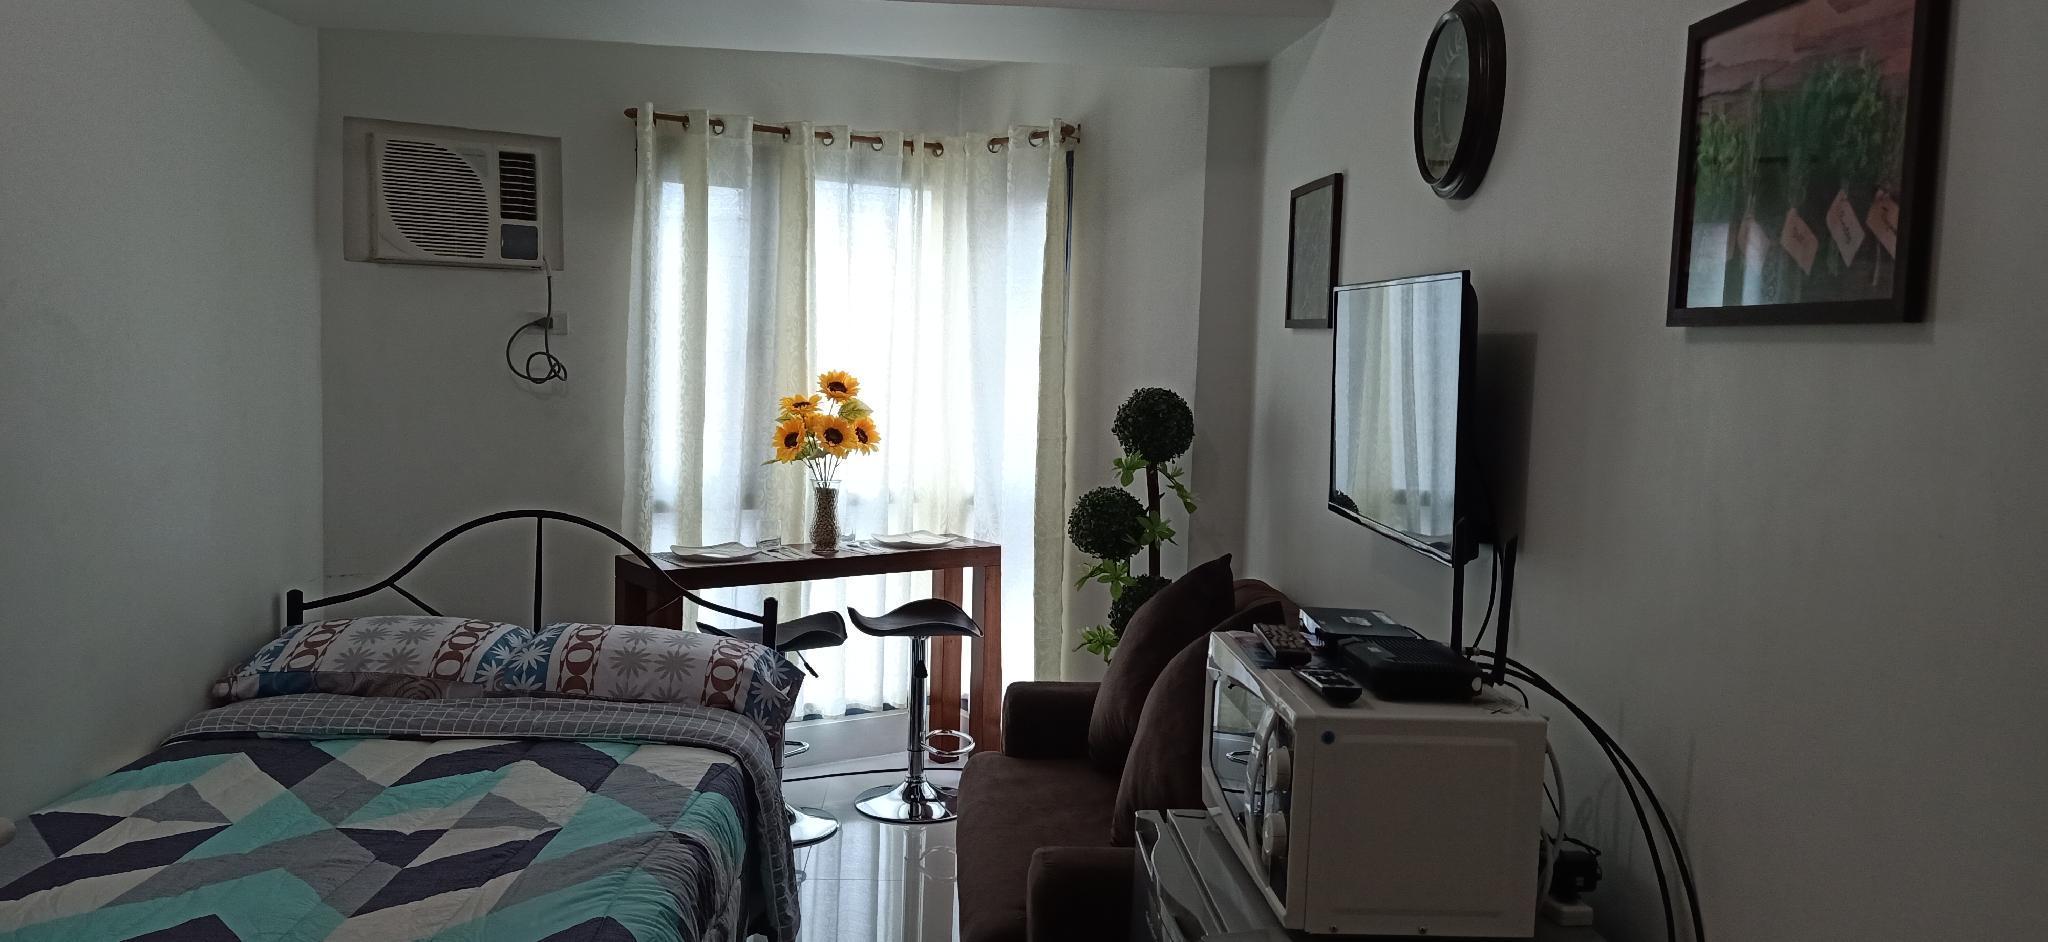 Rk Staycation Grand Riviera Suites